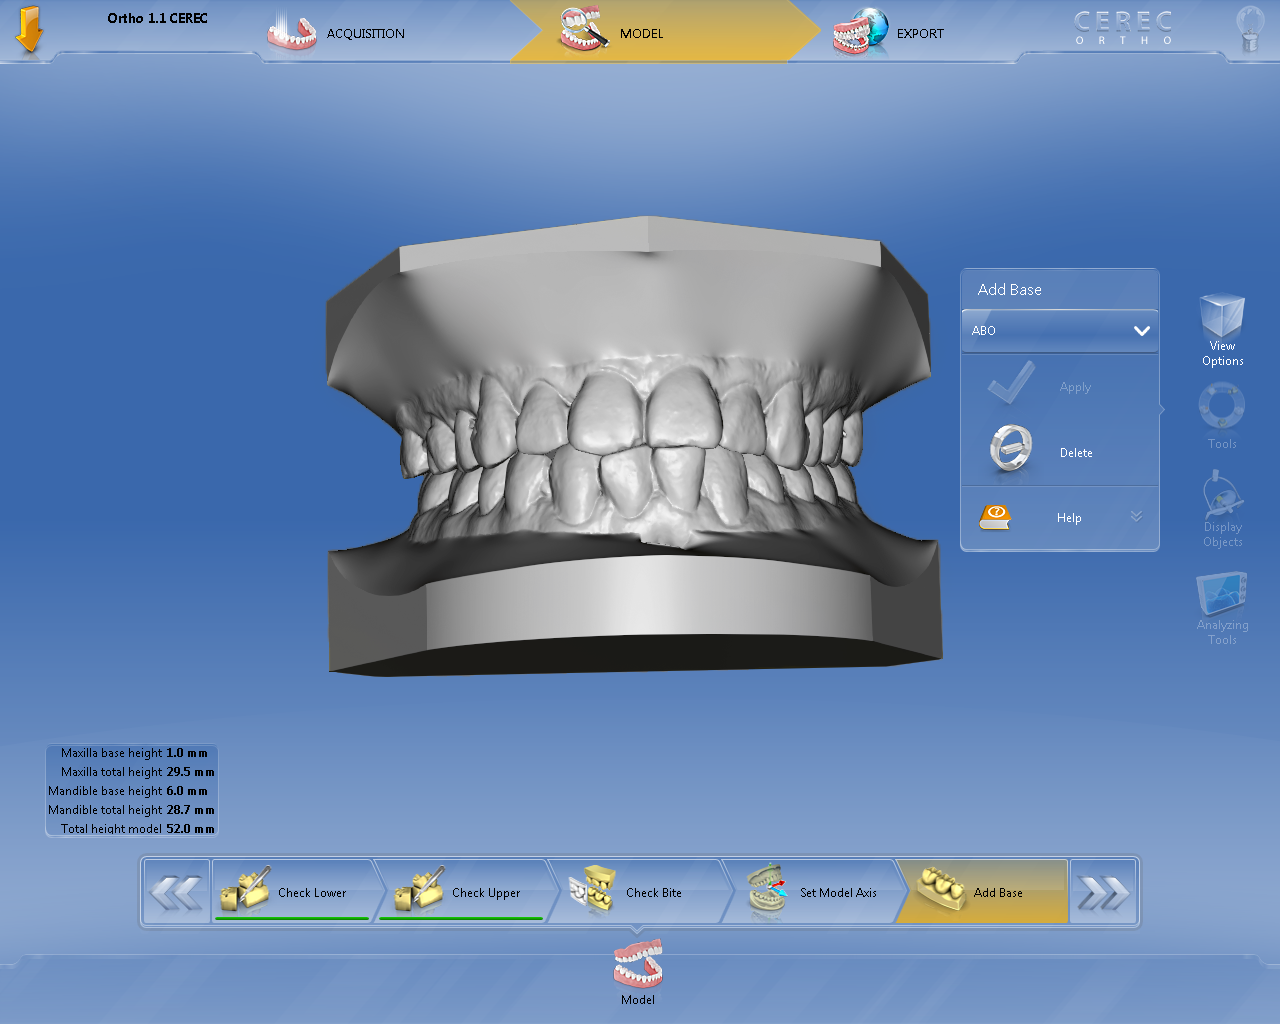 orthodontics patterson dental